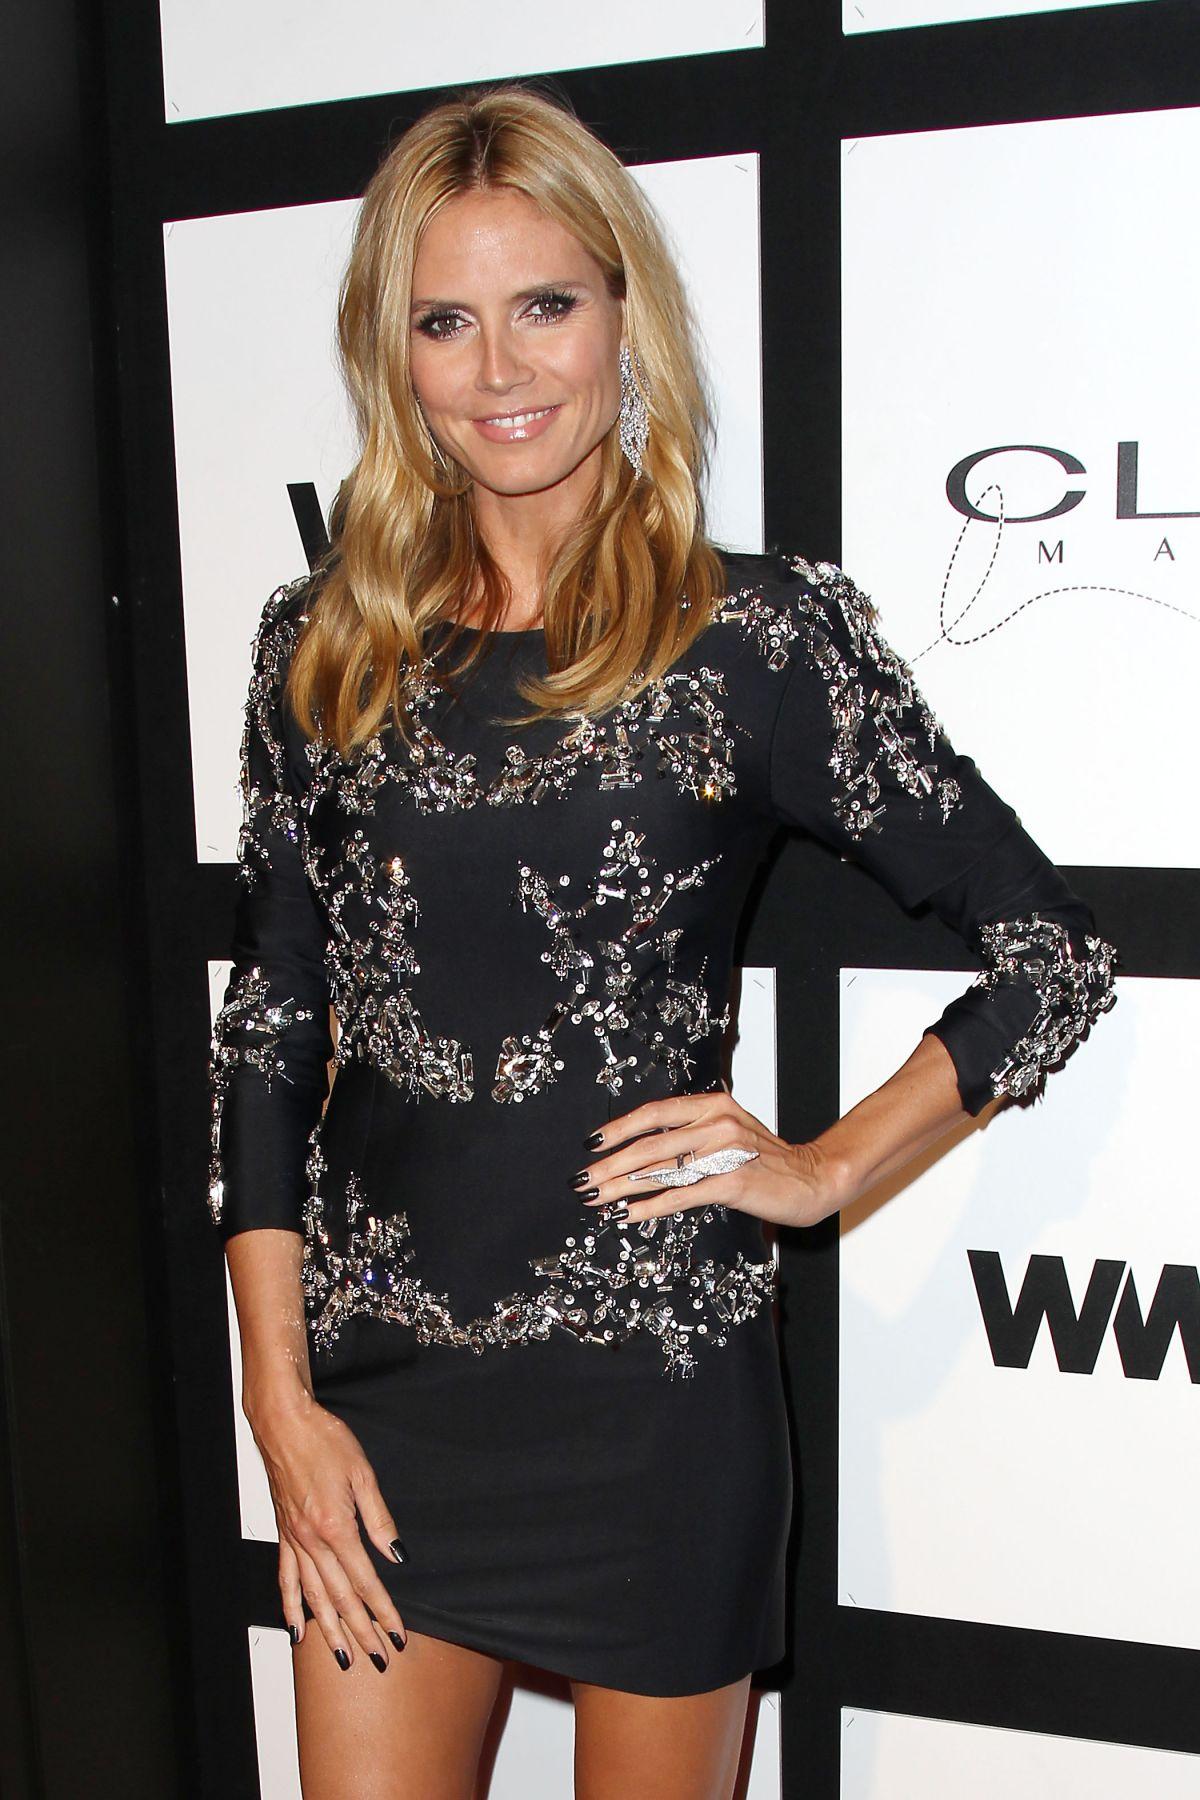 HEIDI KLUM at 2015 Clio Awards in New York